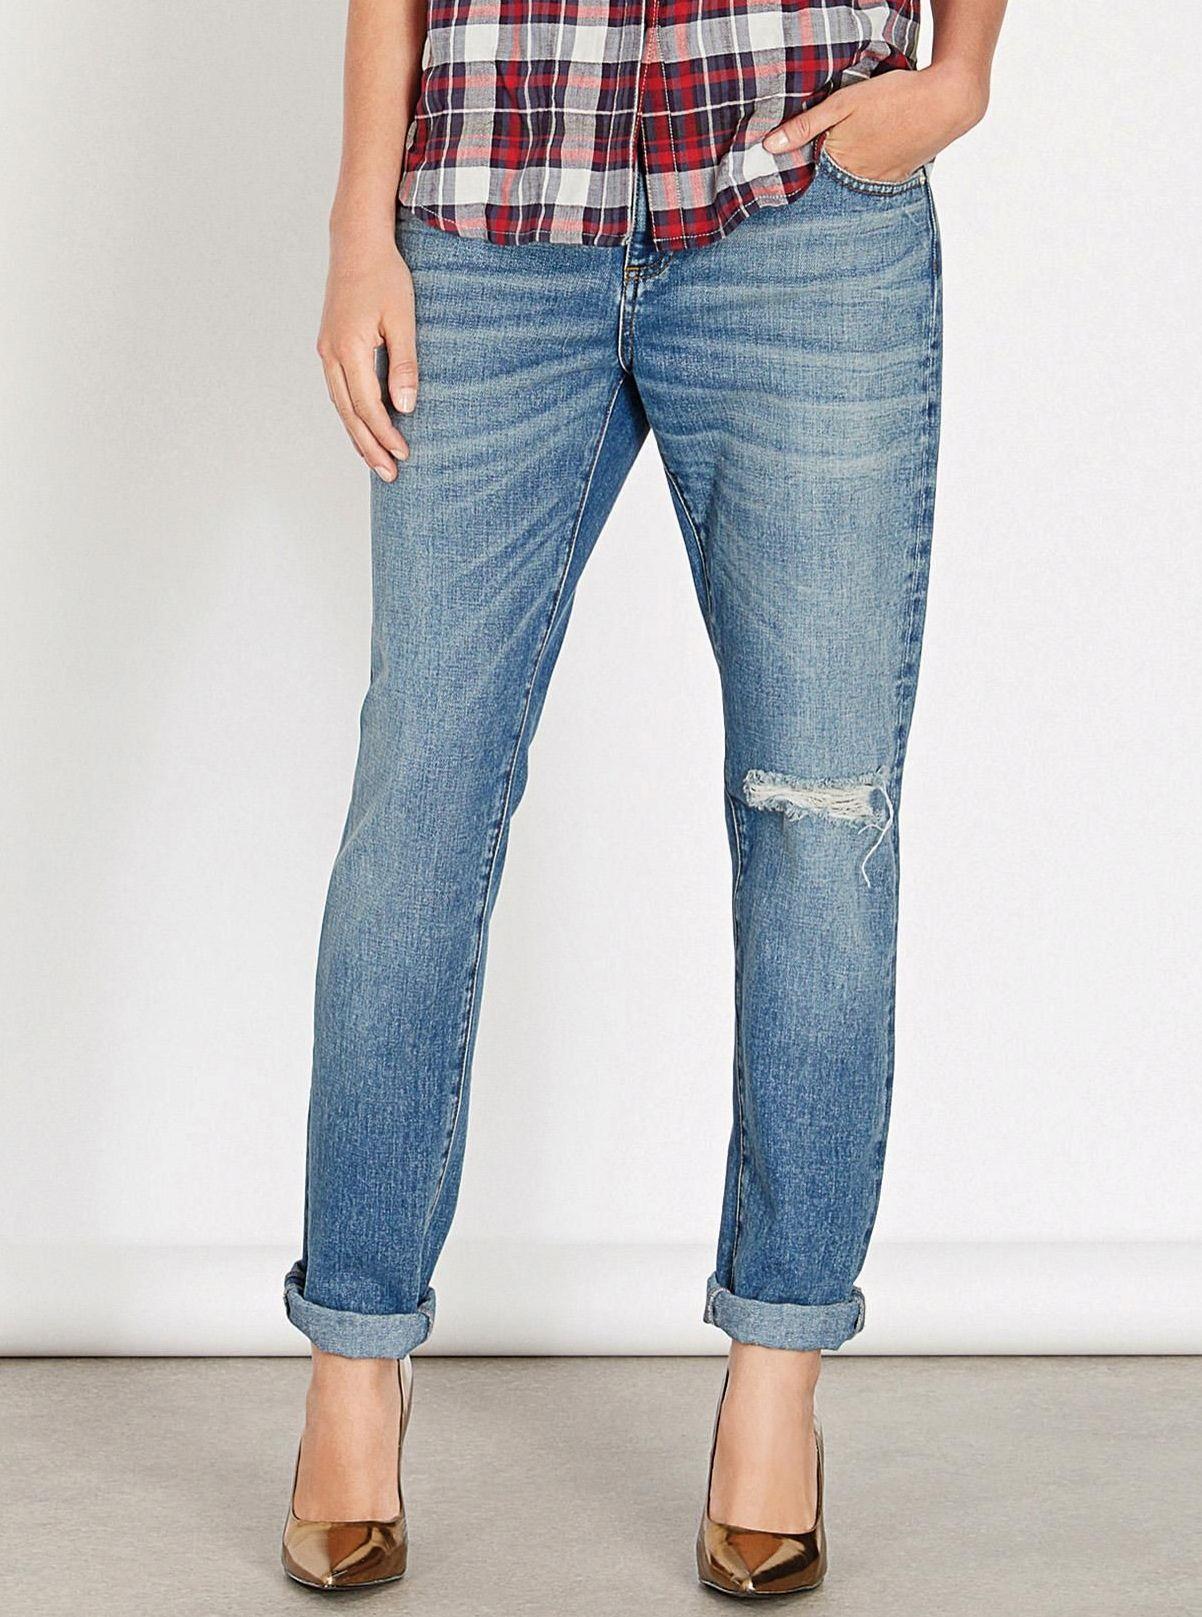 Warehouse Light Wash Girlfriend Jeans at Next